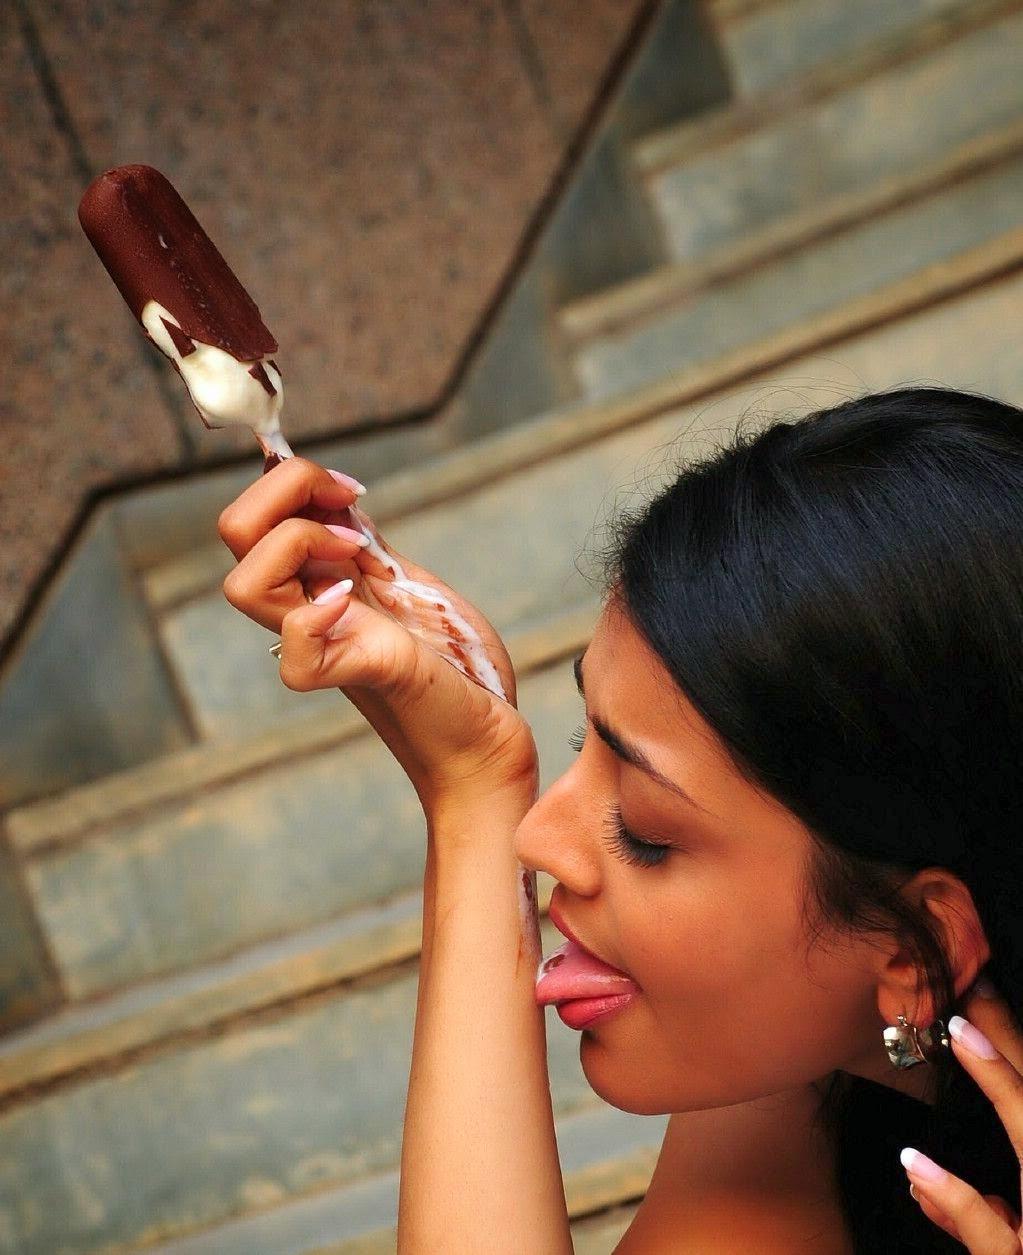 Kajal Aggarwal - A South Indian Actress Hot pics in Saree eating Icecream